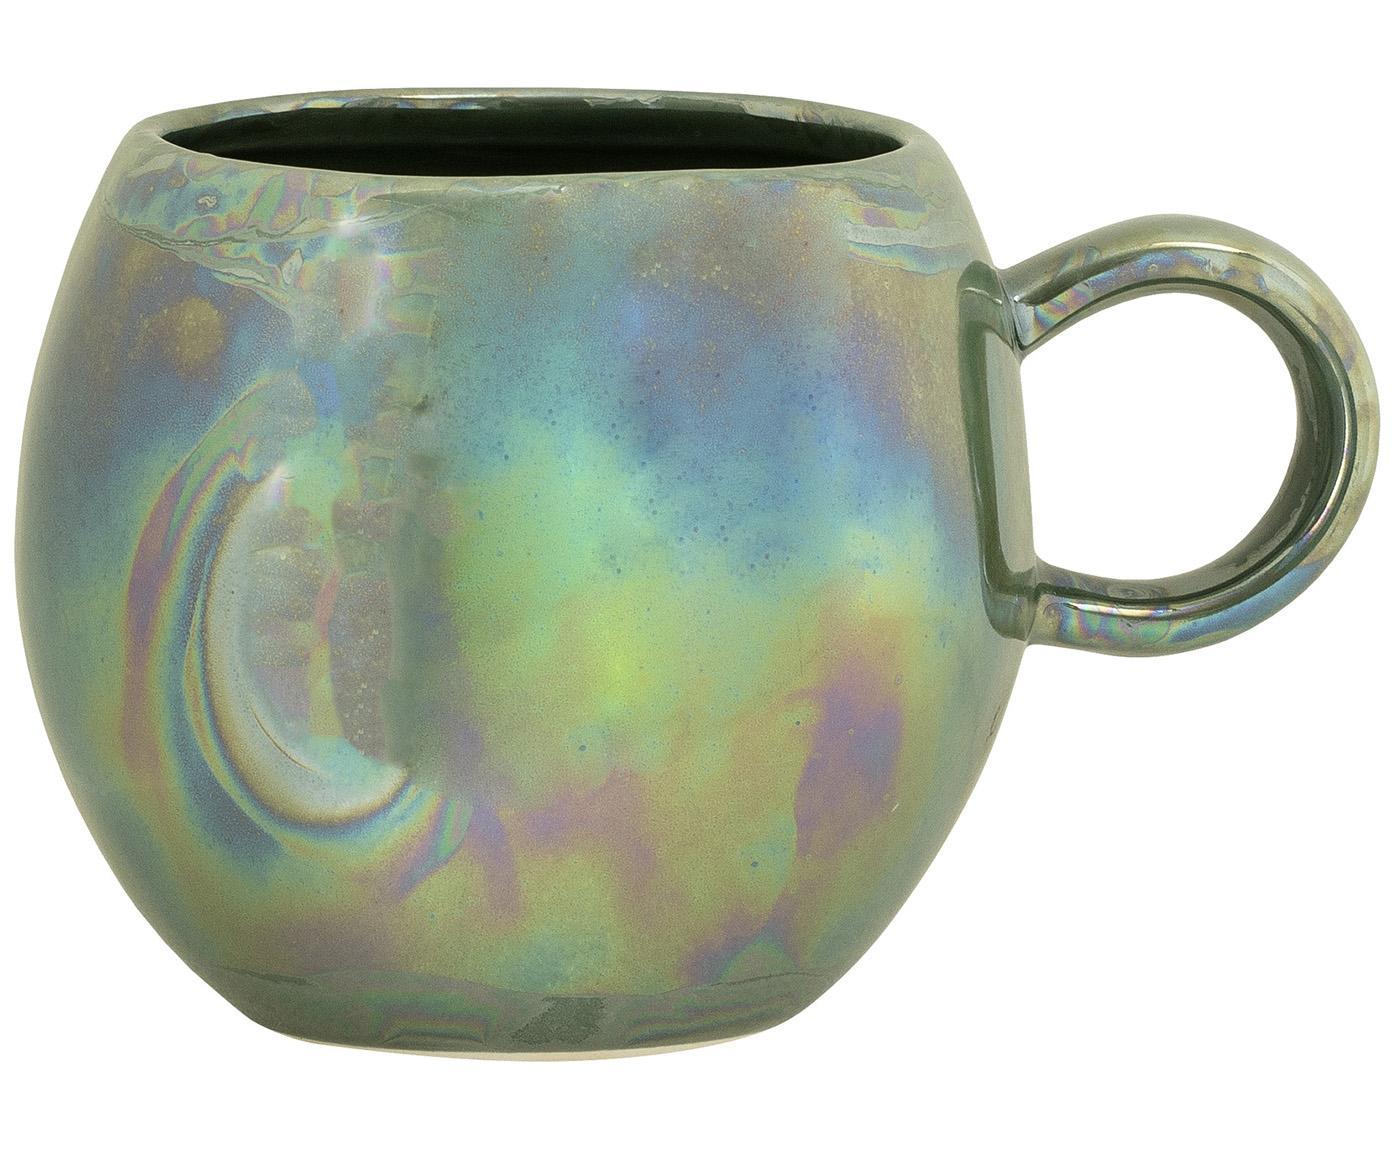 Tasse Pino, Keramik, Grüntöne, Ø 9 x H 8 cm